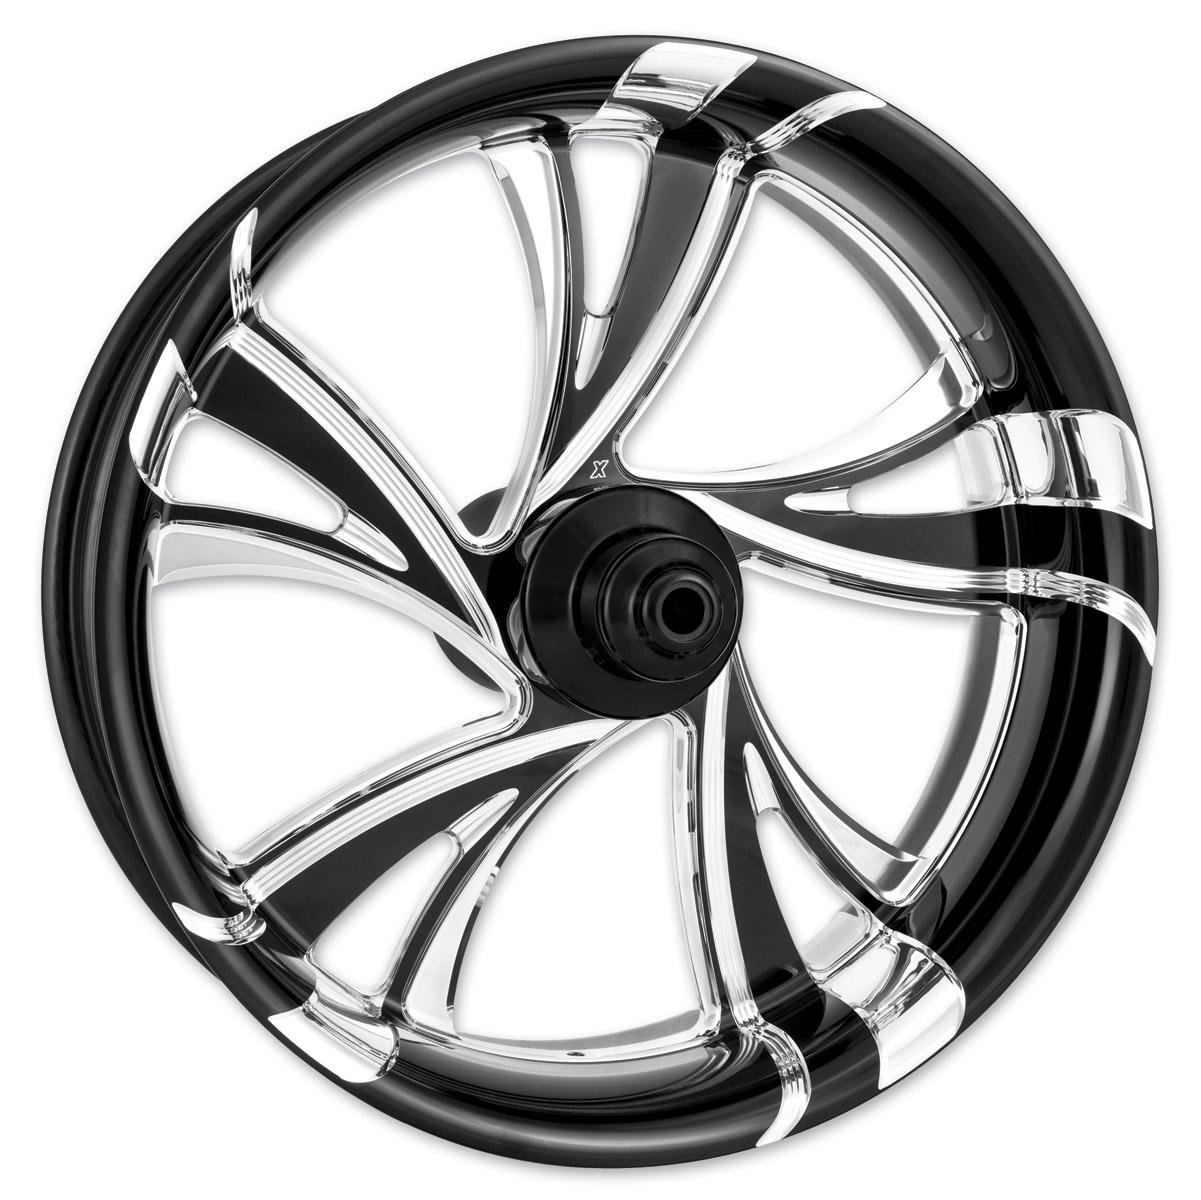 xtreme machine black cut xquisite f ed cruise front wheel 23 x Pickup Canopy Racks xtreme machine black cut xquisite f ed cruise front wheel 23 x 3 5